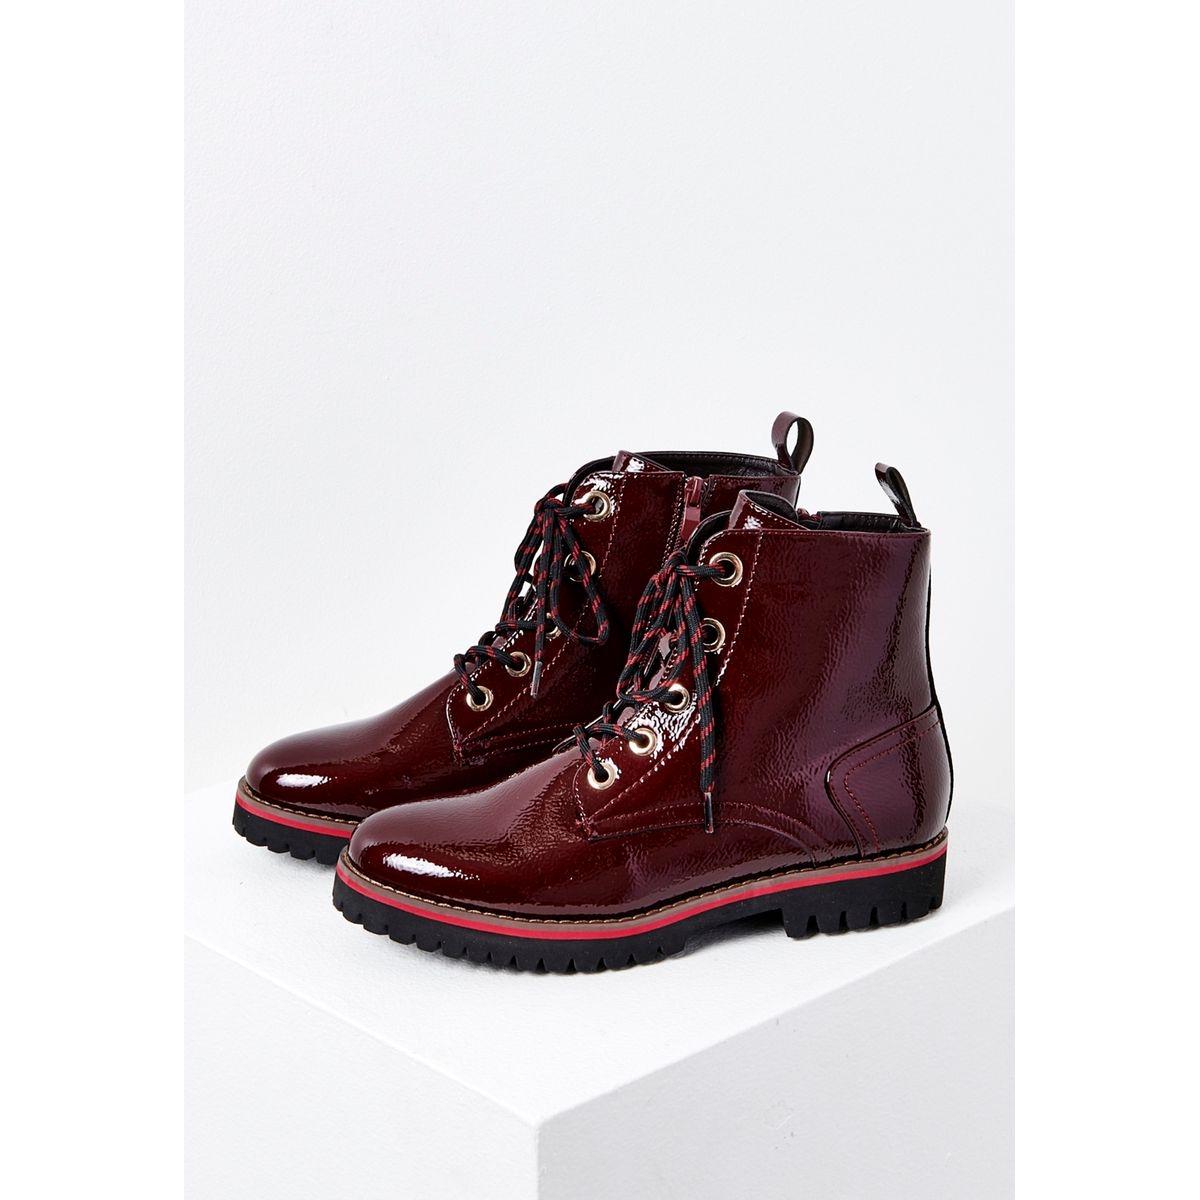 Boots montantes vernies